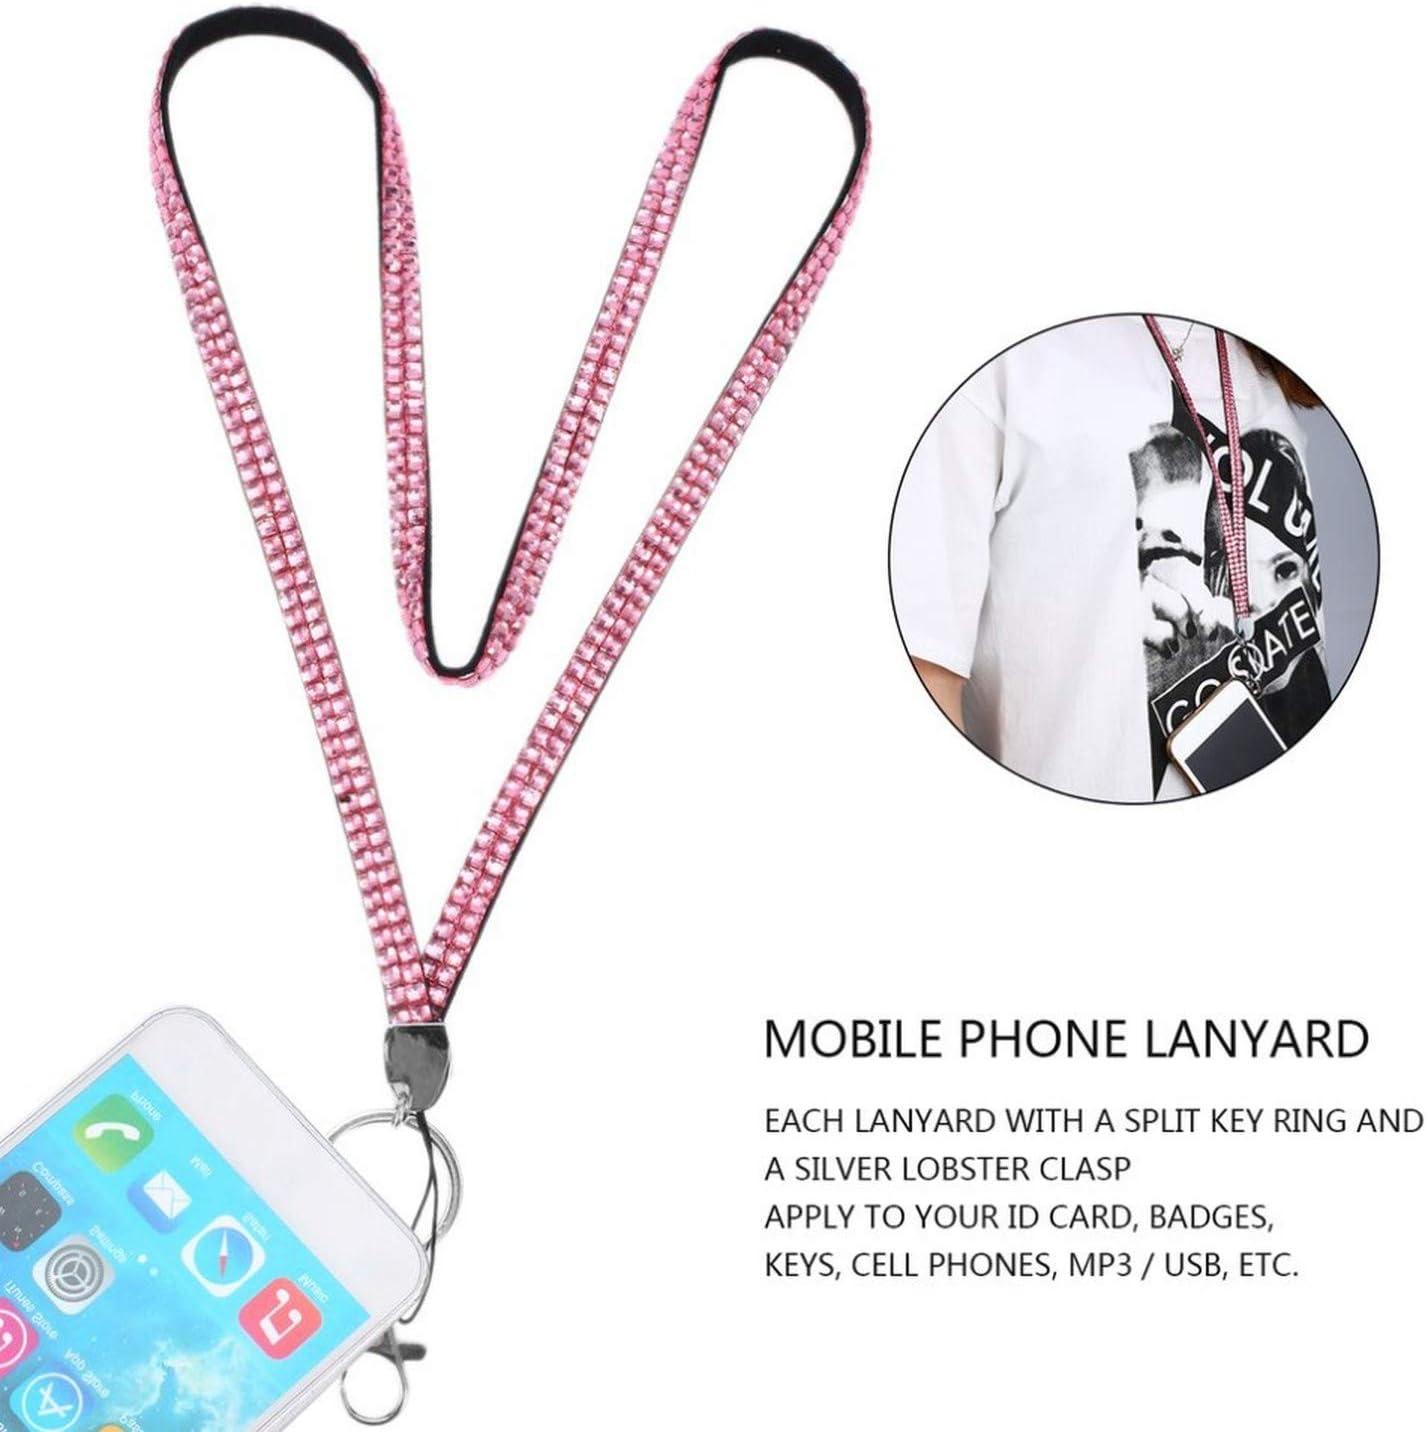 Qkkstore Rhinestonek Strap Lanyards /& Id Badgephone Key Holder Ring Mobile Phone Strap Crystal Bling,Pink